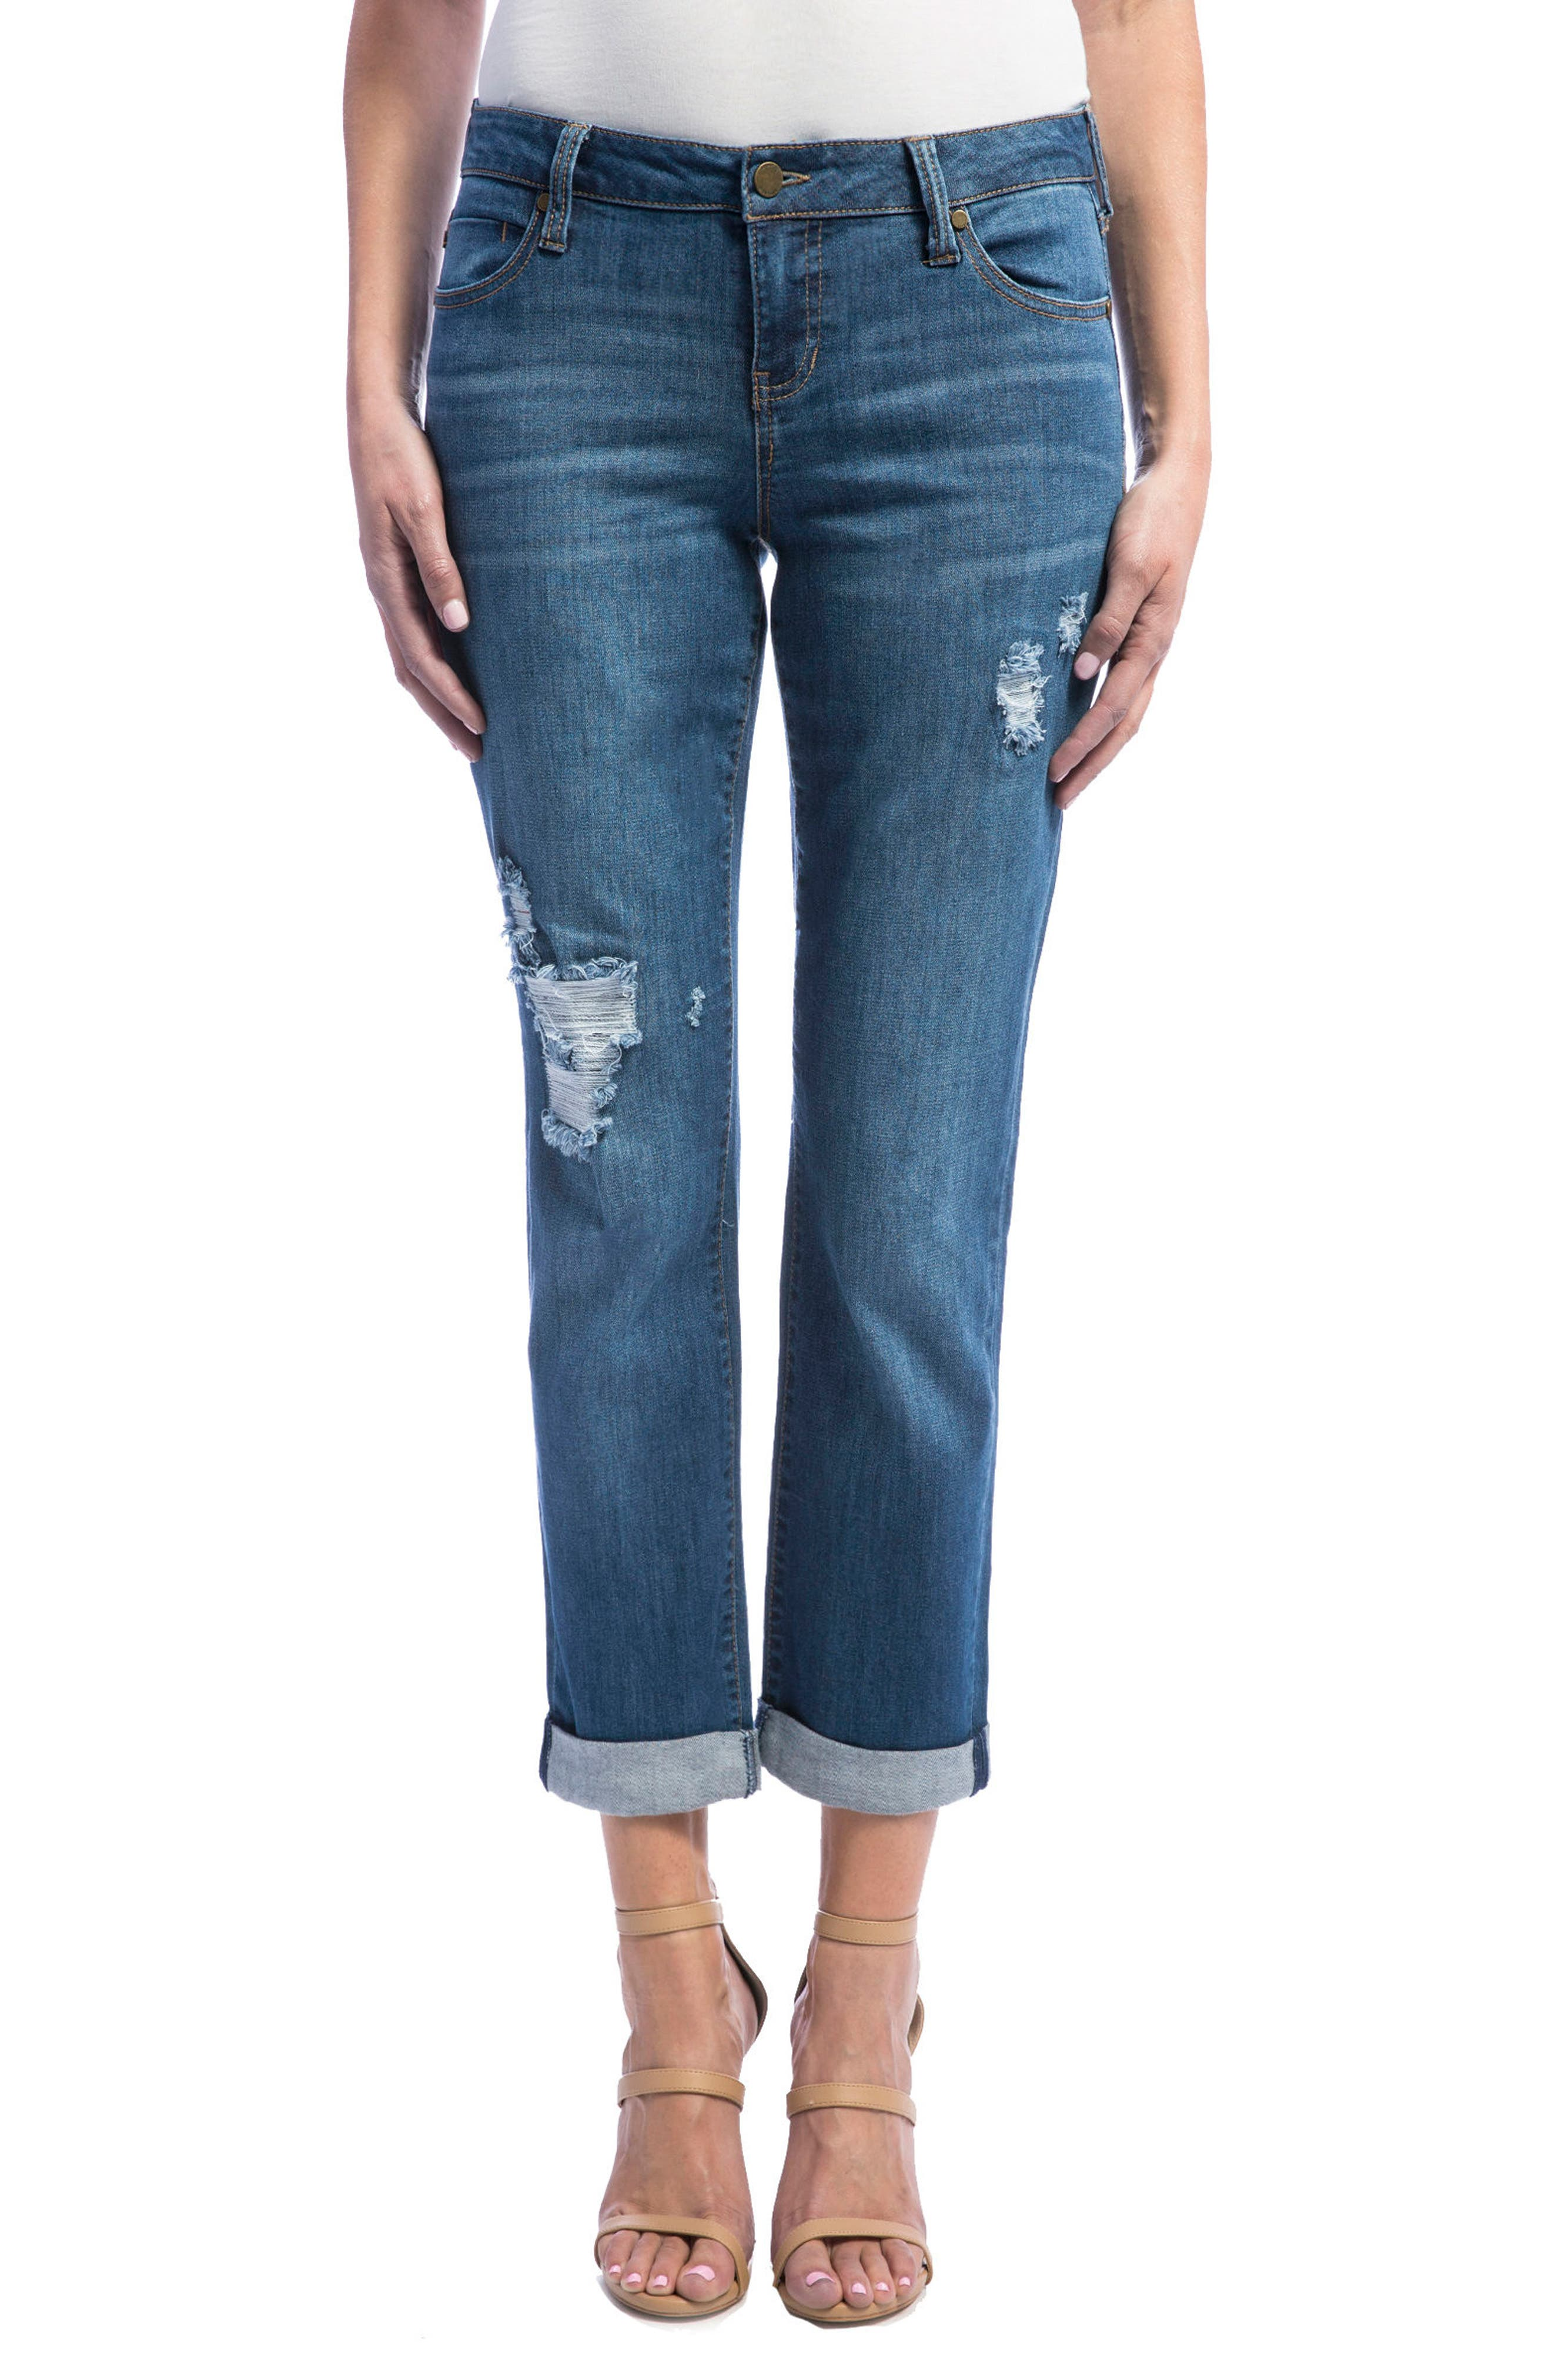 Main Image - Liverpool Jeans Company Peyton Slim Stretch Crop Boyfriend Jeans (Montauk Mid/Destruction)